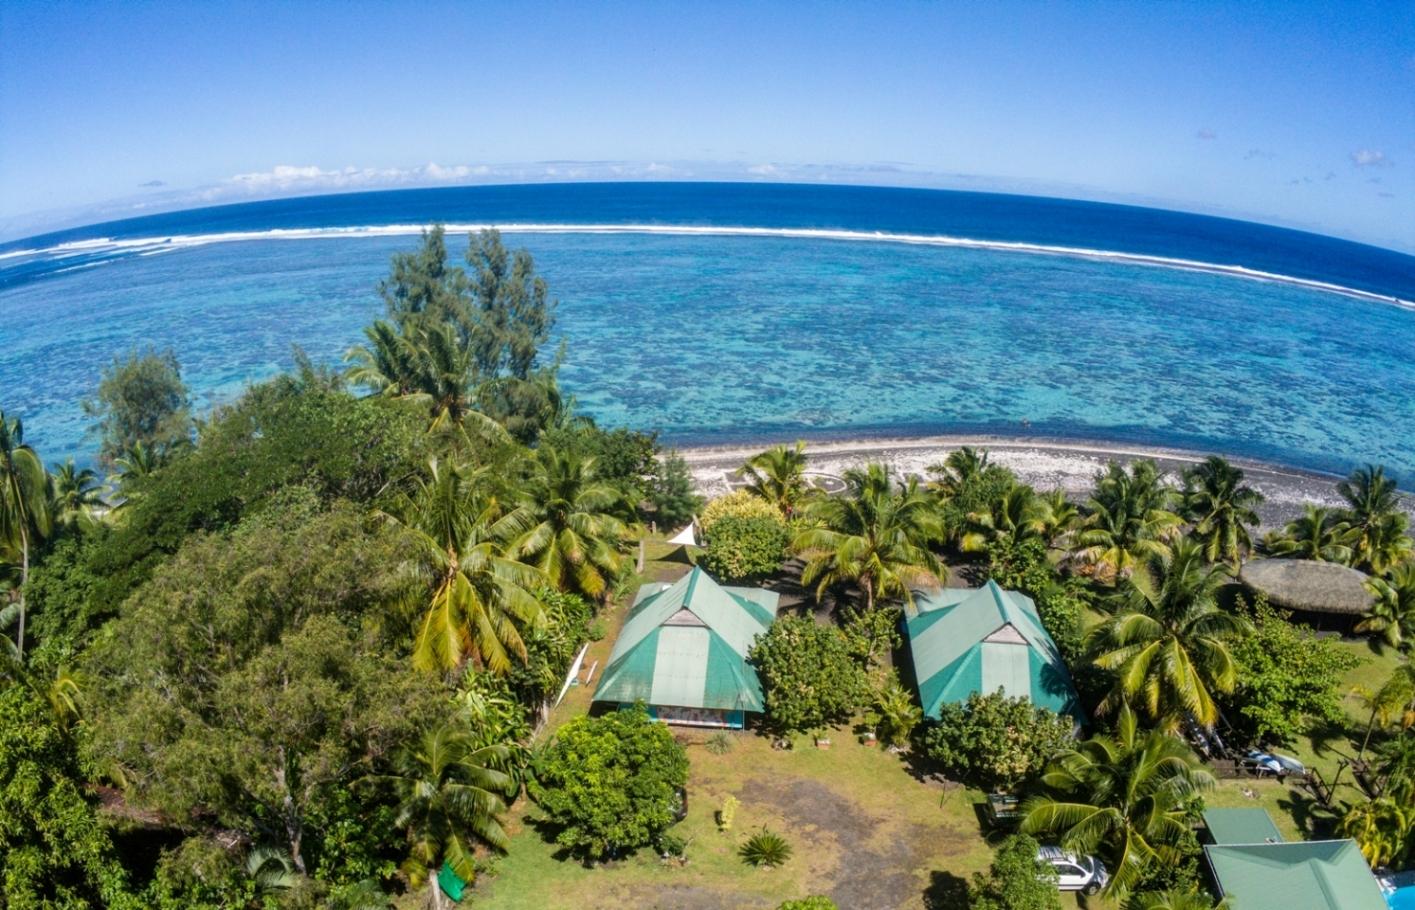 https://tahititourisme.cl/wp-content/uploads/2019/08/copie-Tahiti-tourisme-948ko.jpg